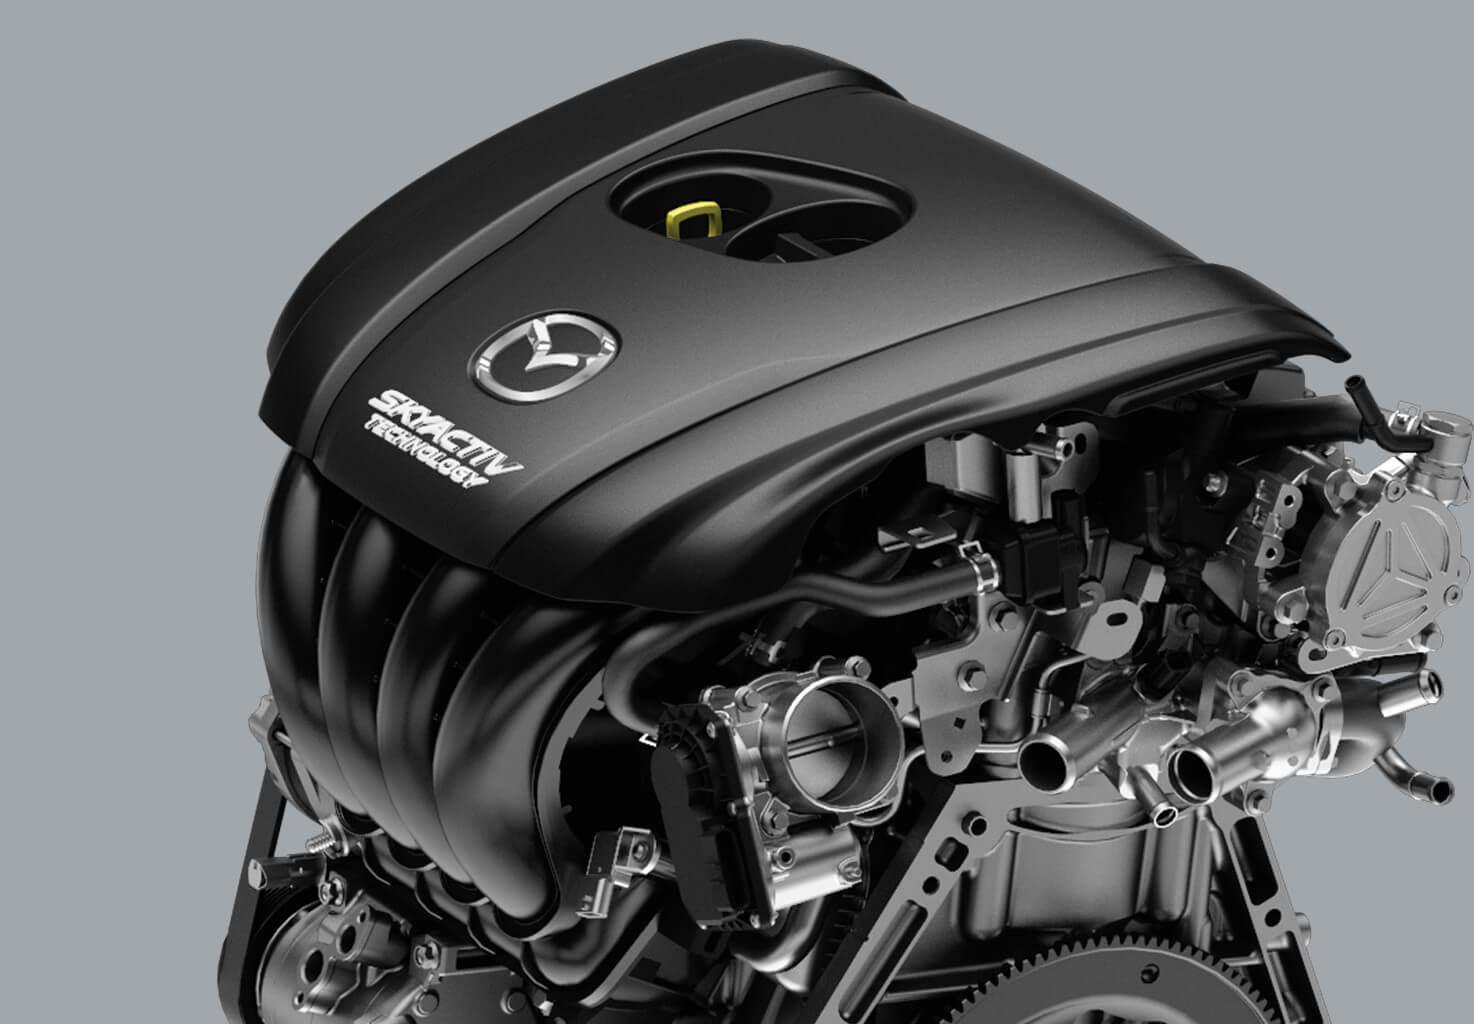 Skyactive technology Mazda motor